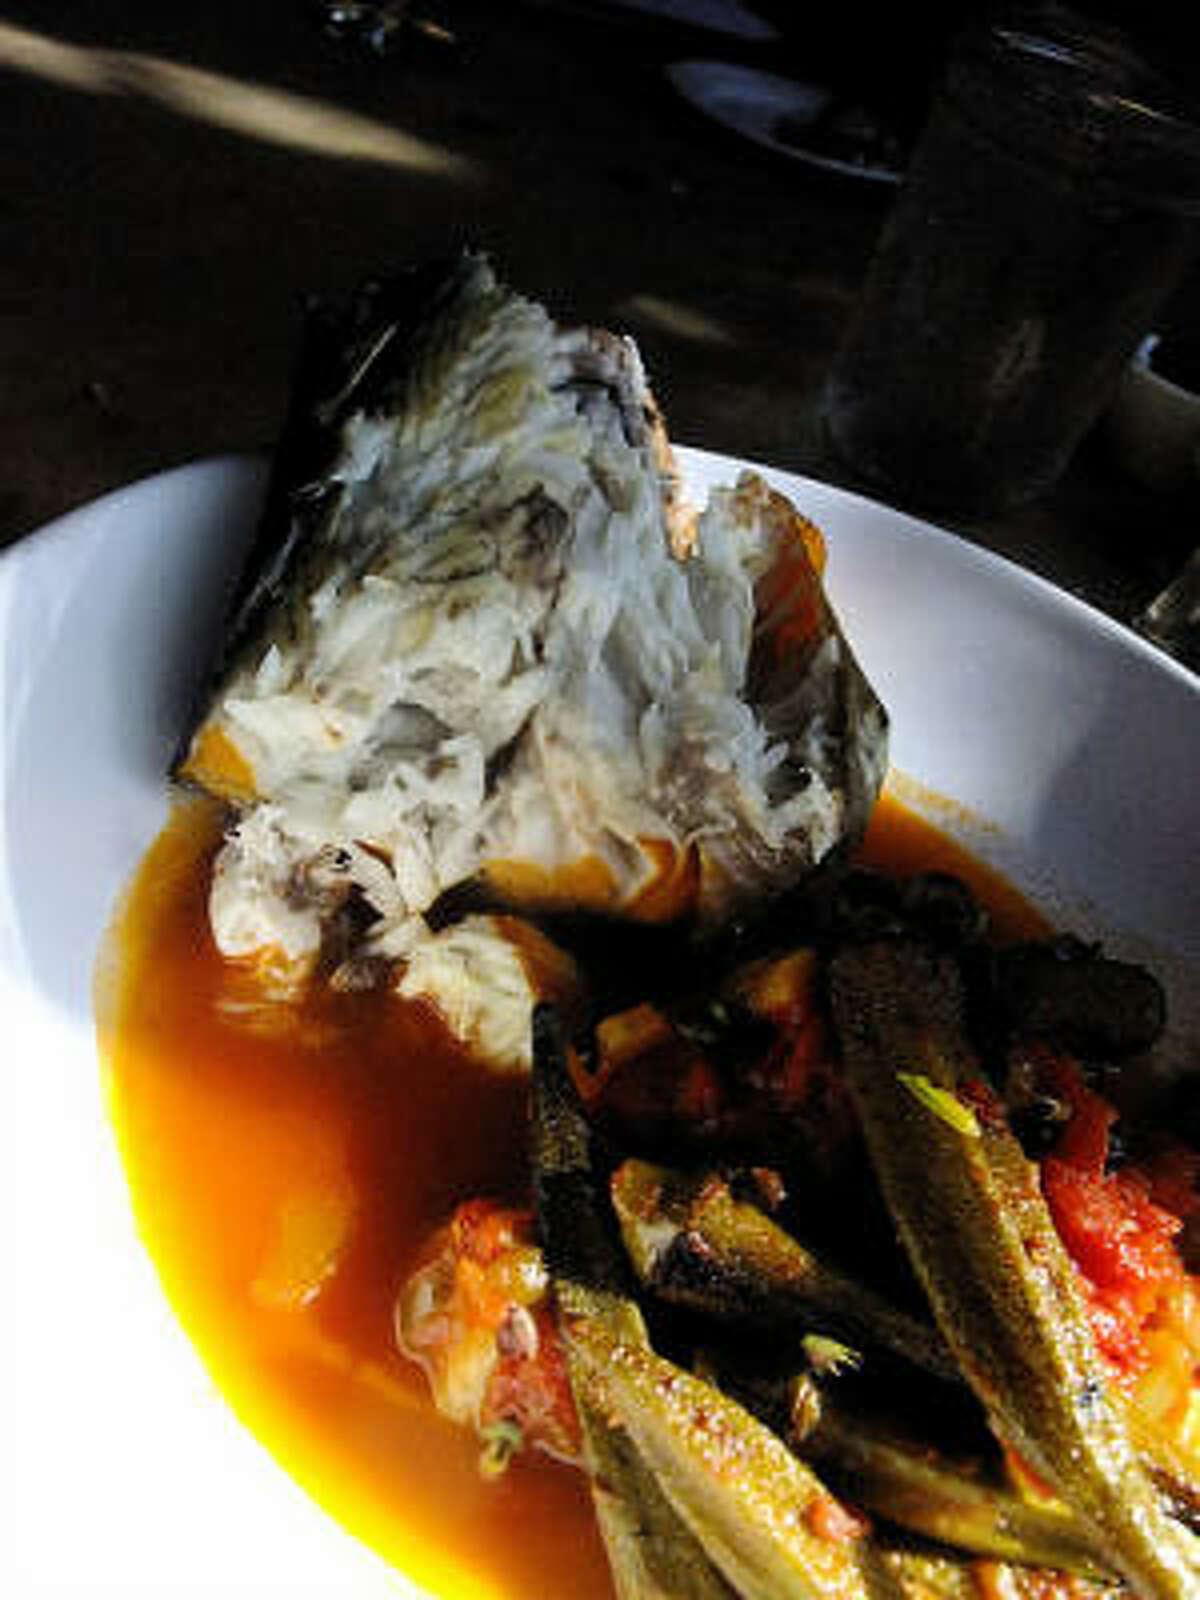 Hay-smoked Gulf mackerel with pan-roasted okra & tomato, Bootsie's Heritage Cafe, Tomball.